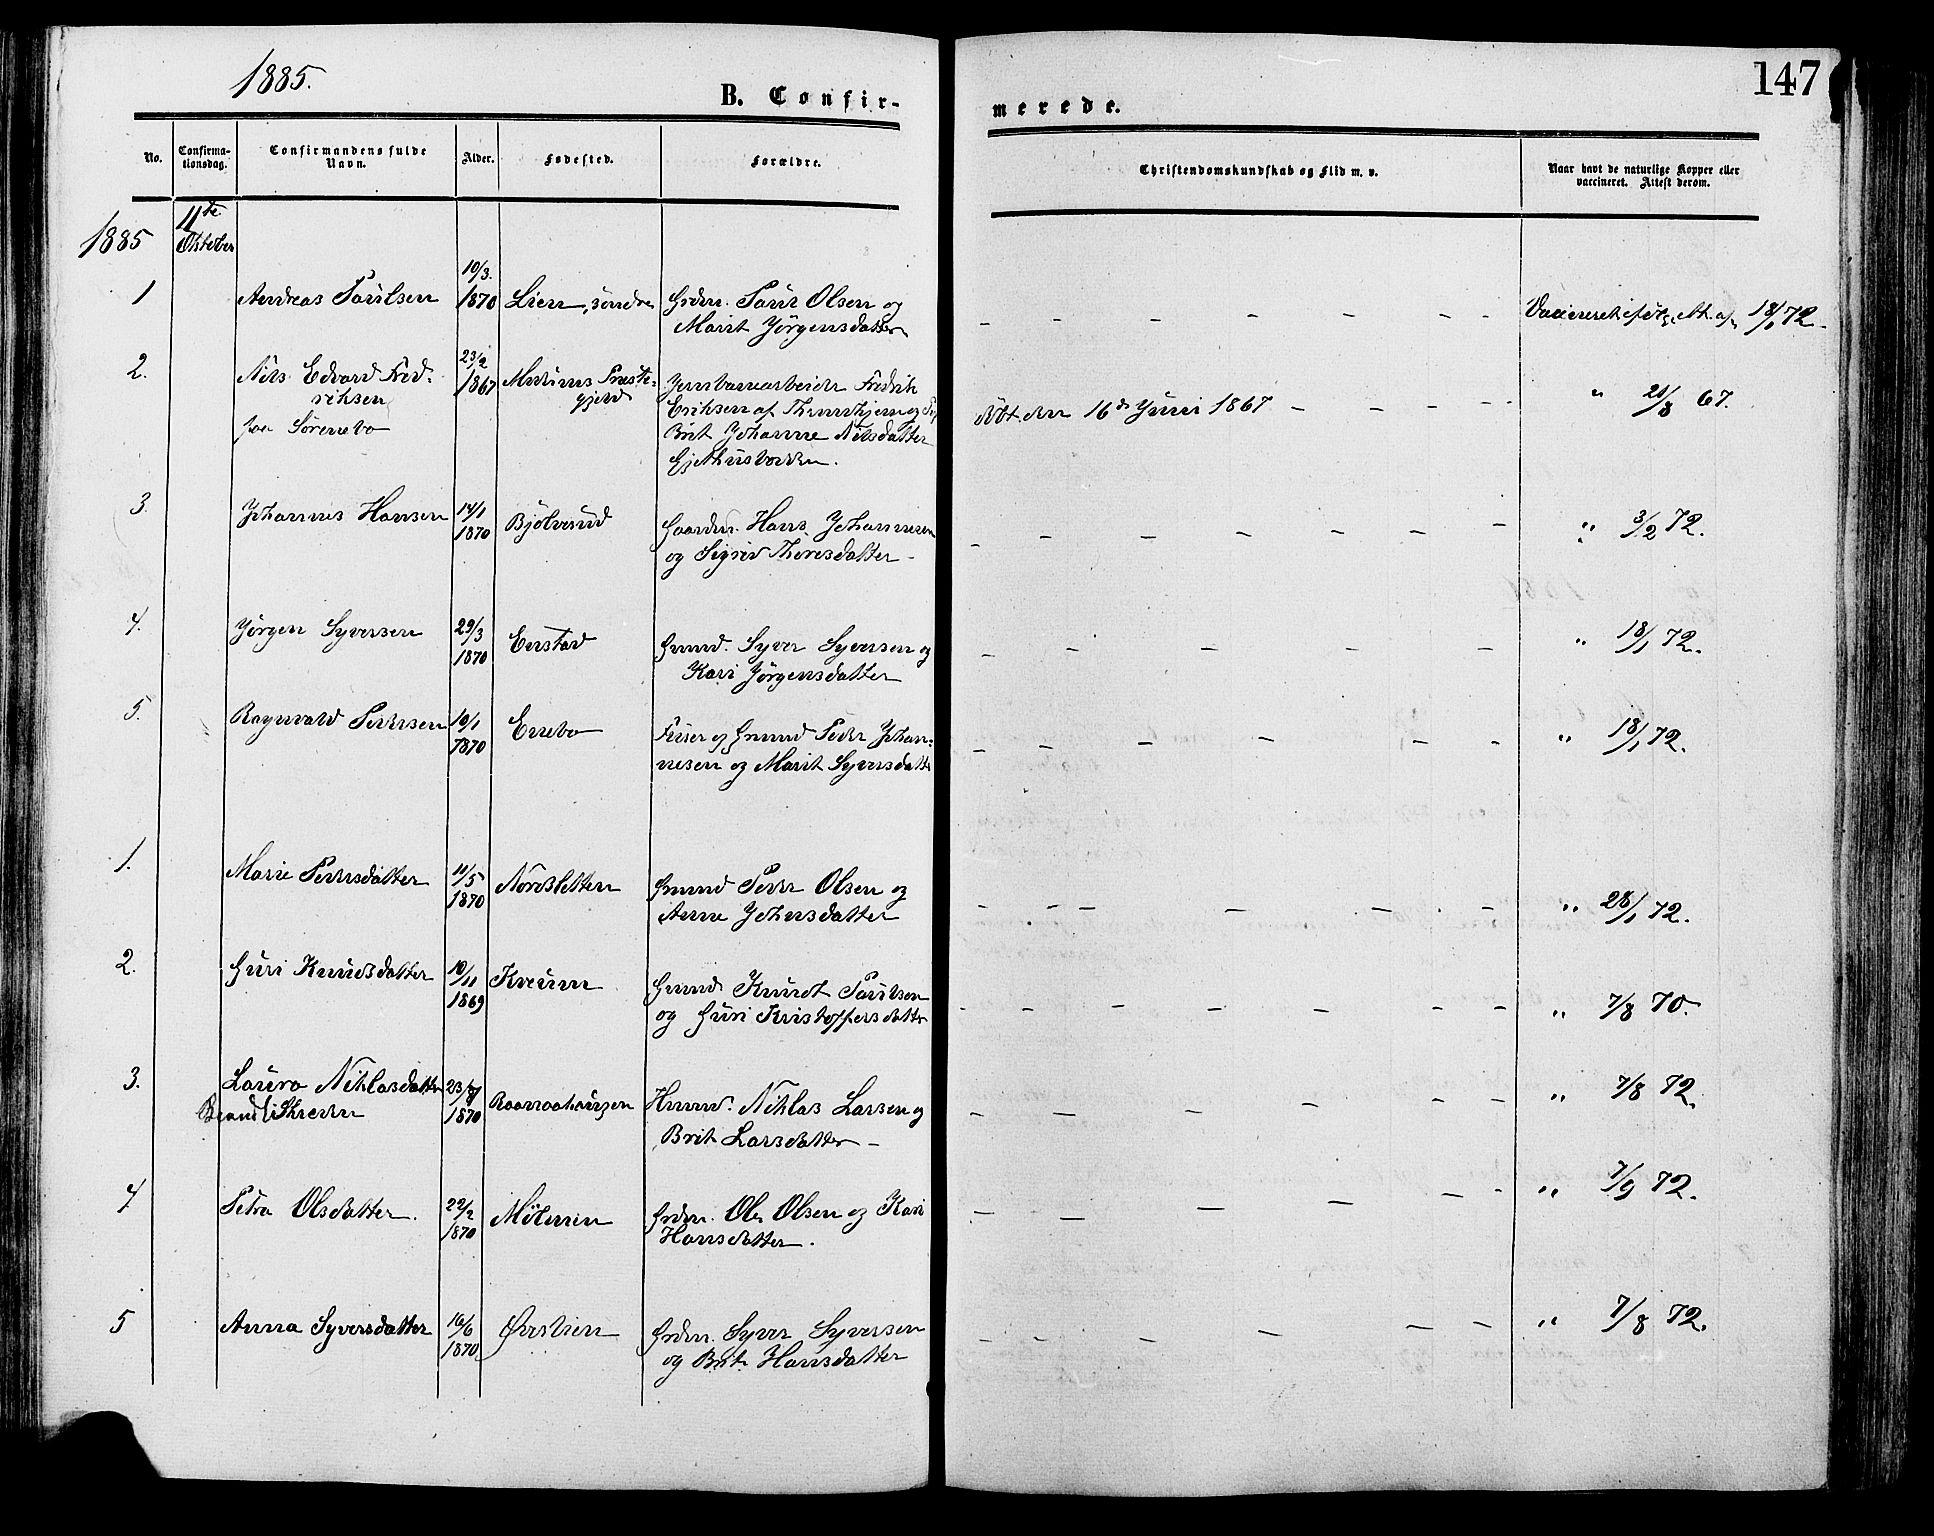 SAH, Lesja prestekontor, Ministerialbok nr. 9, 1854-1889, s. 147